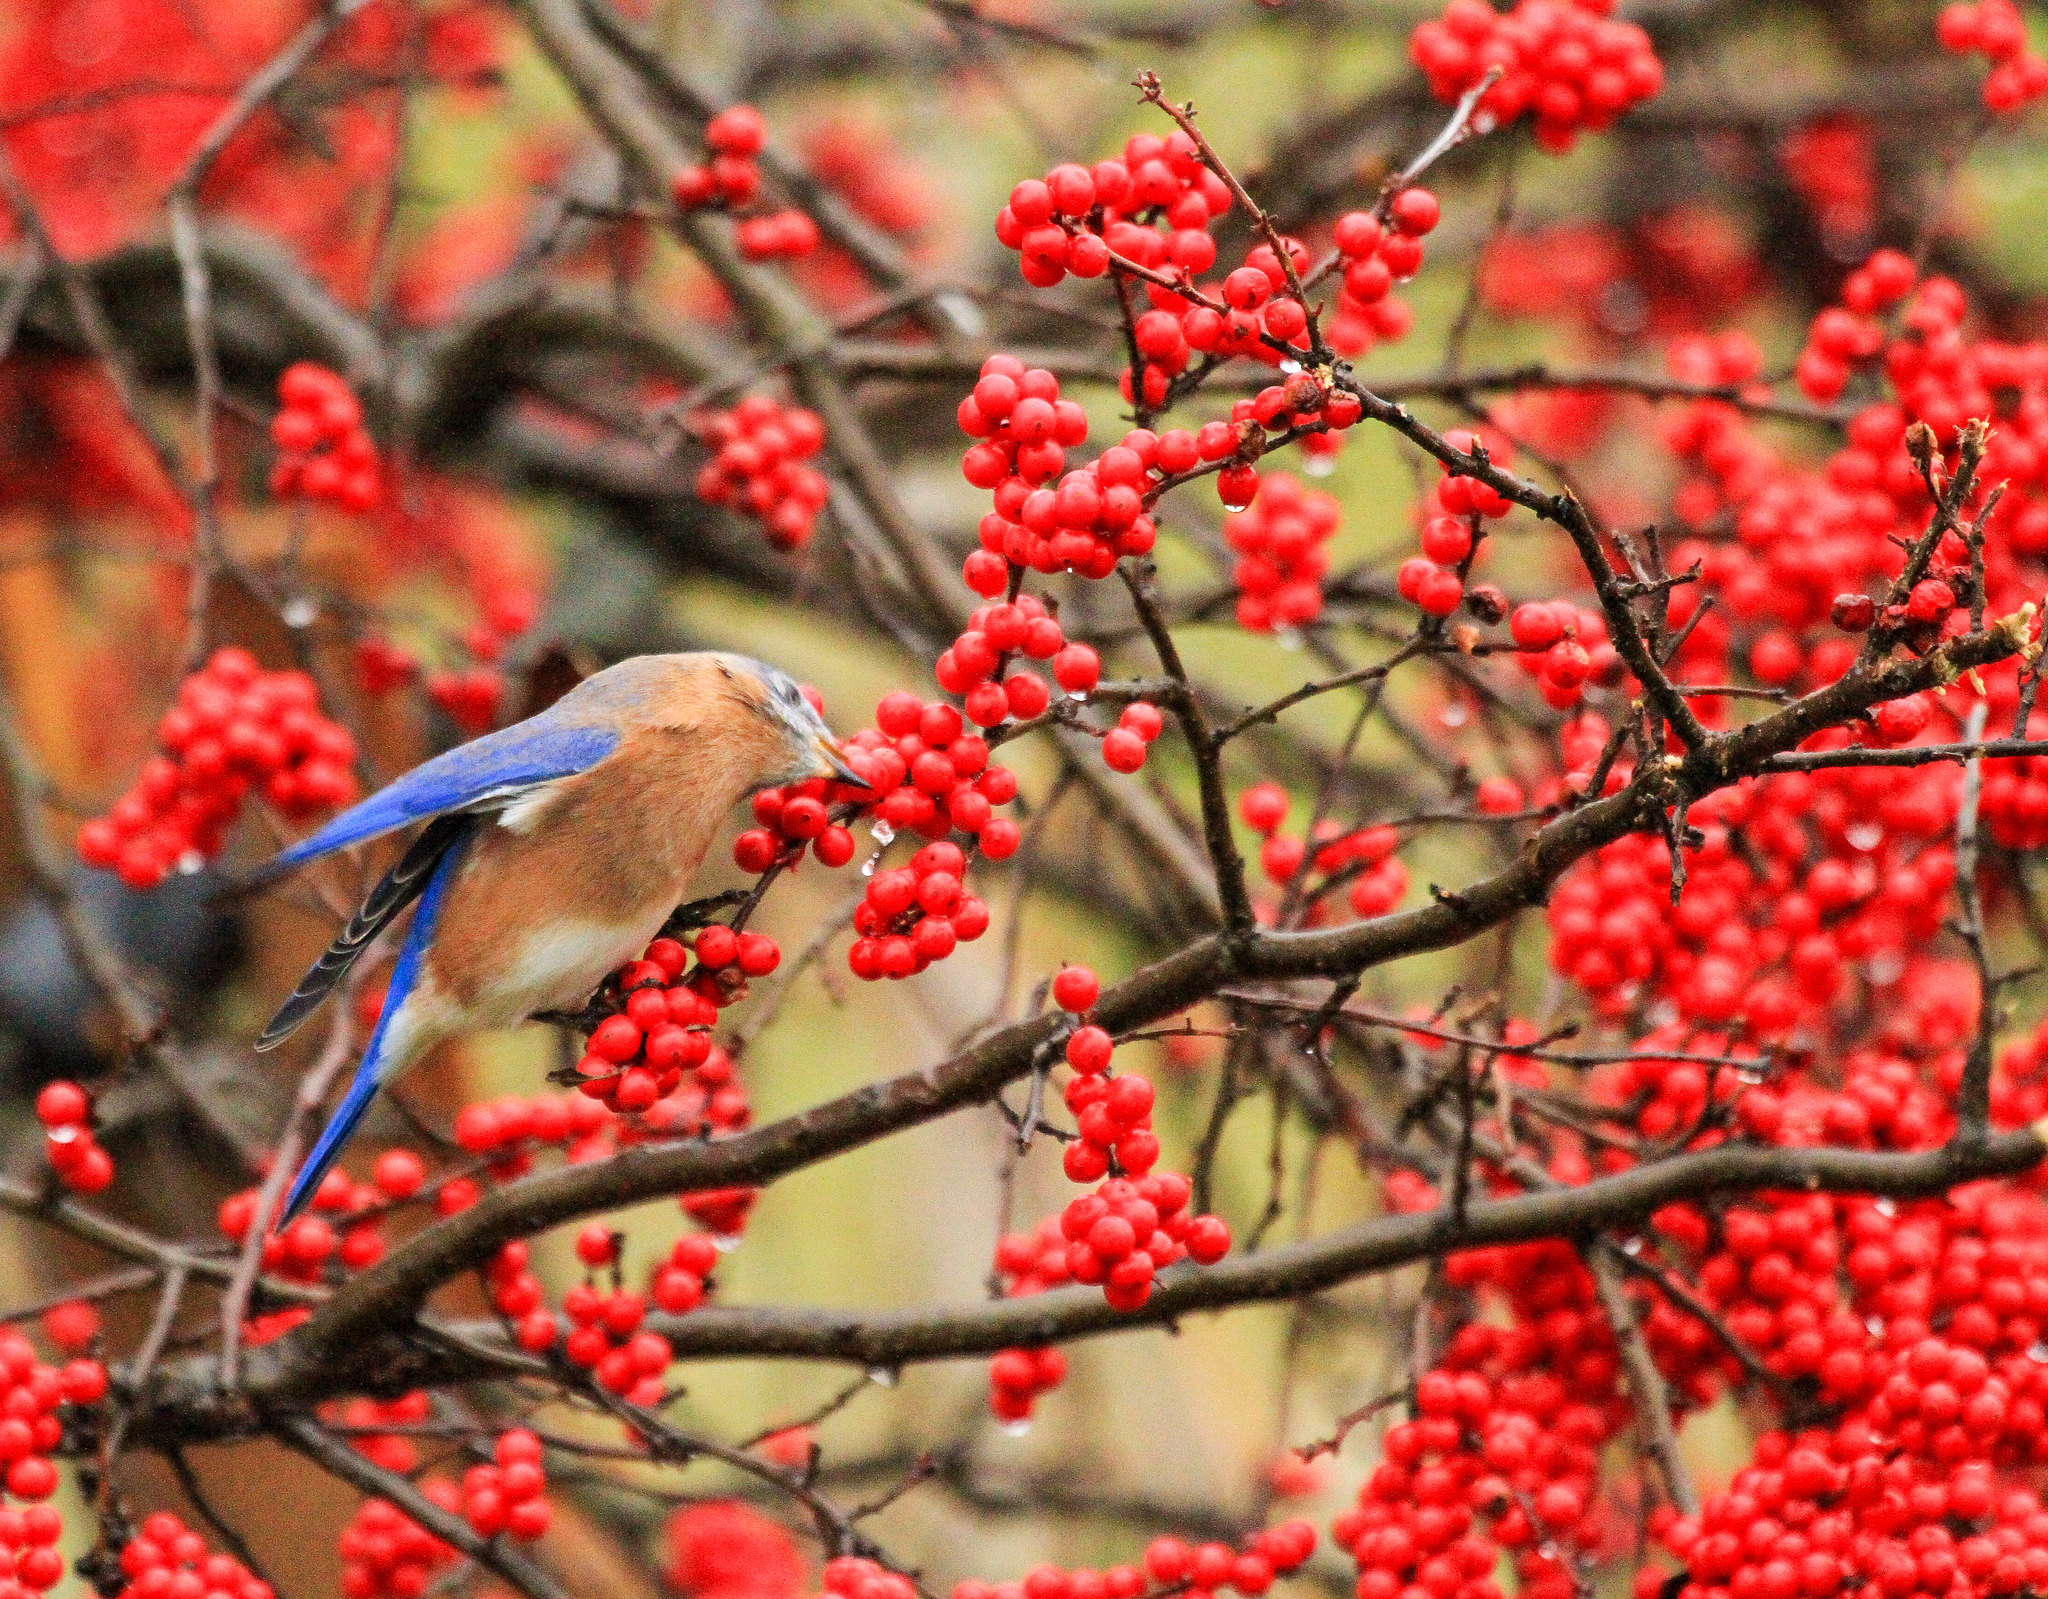 An Eastern Bluebird getting takeout